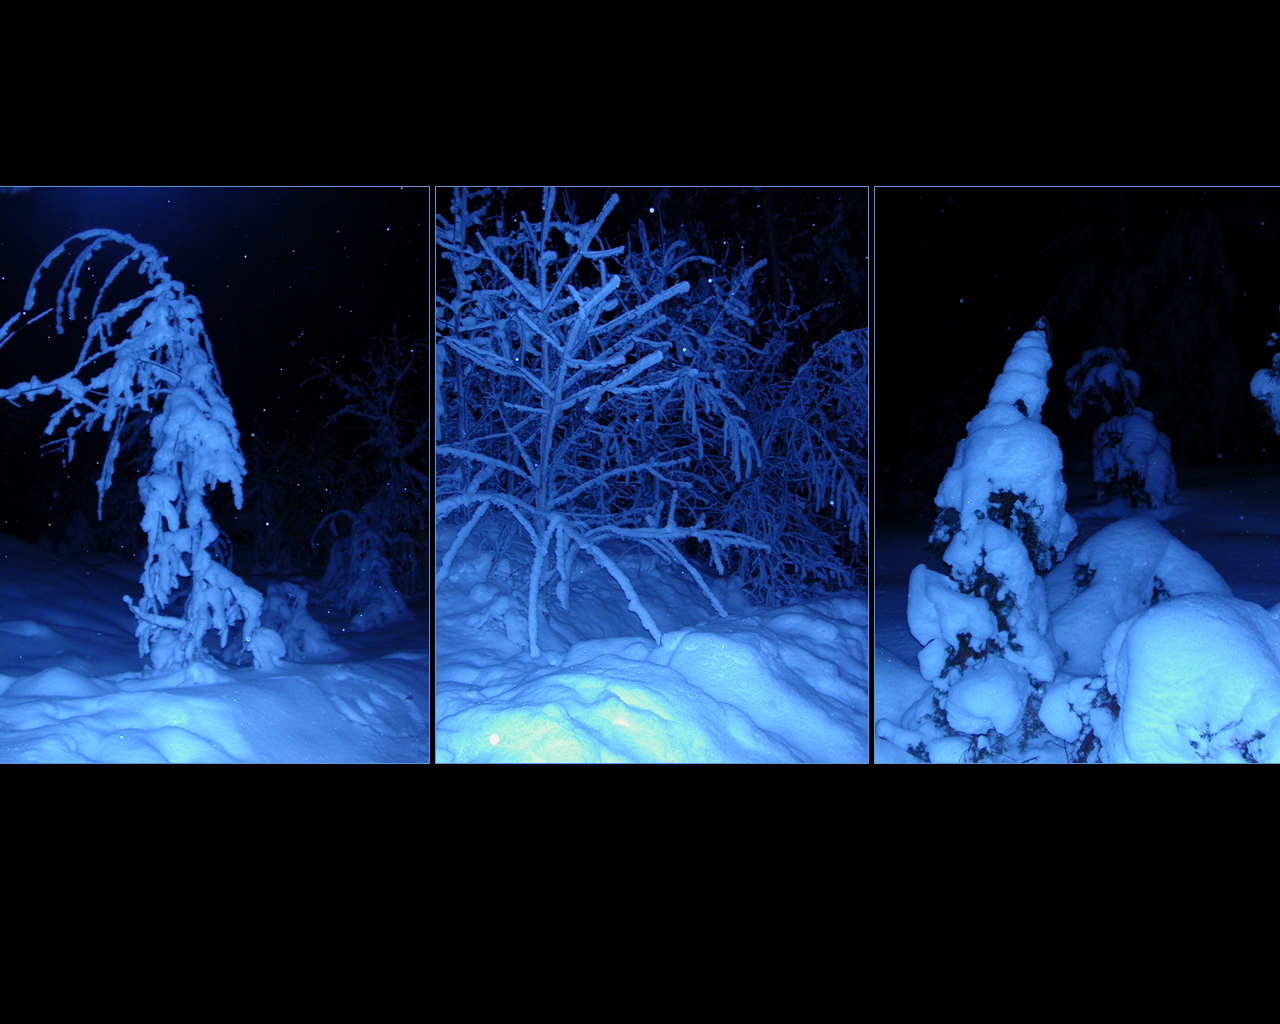 winter-christmas-wallpapers-67.jpg